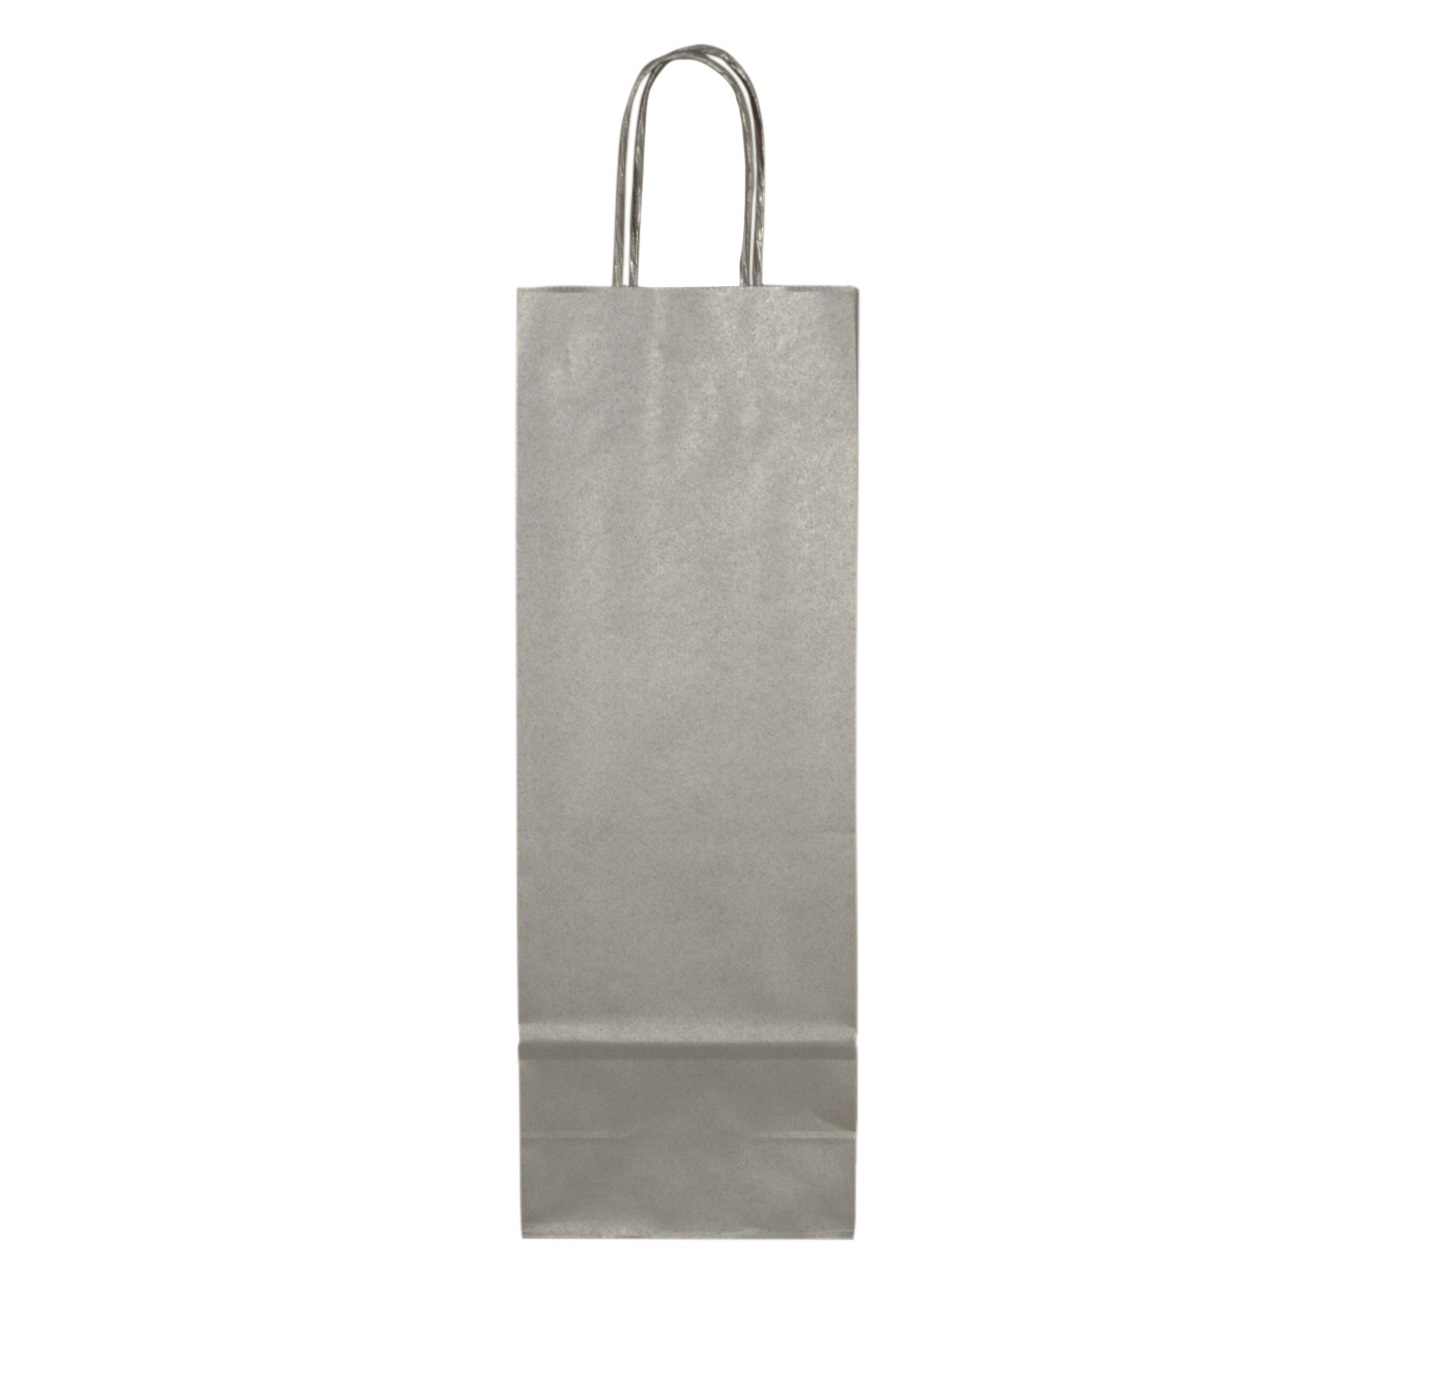 Saco Papel 11x38 Fashion Stripes Branco/Prata